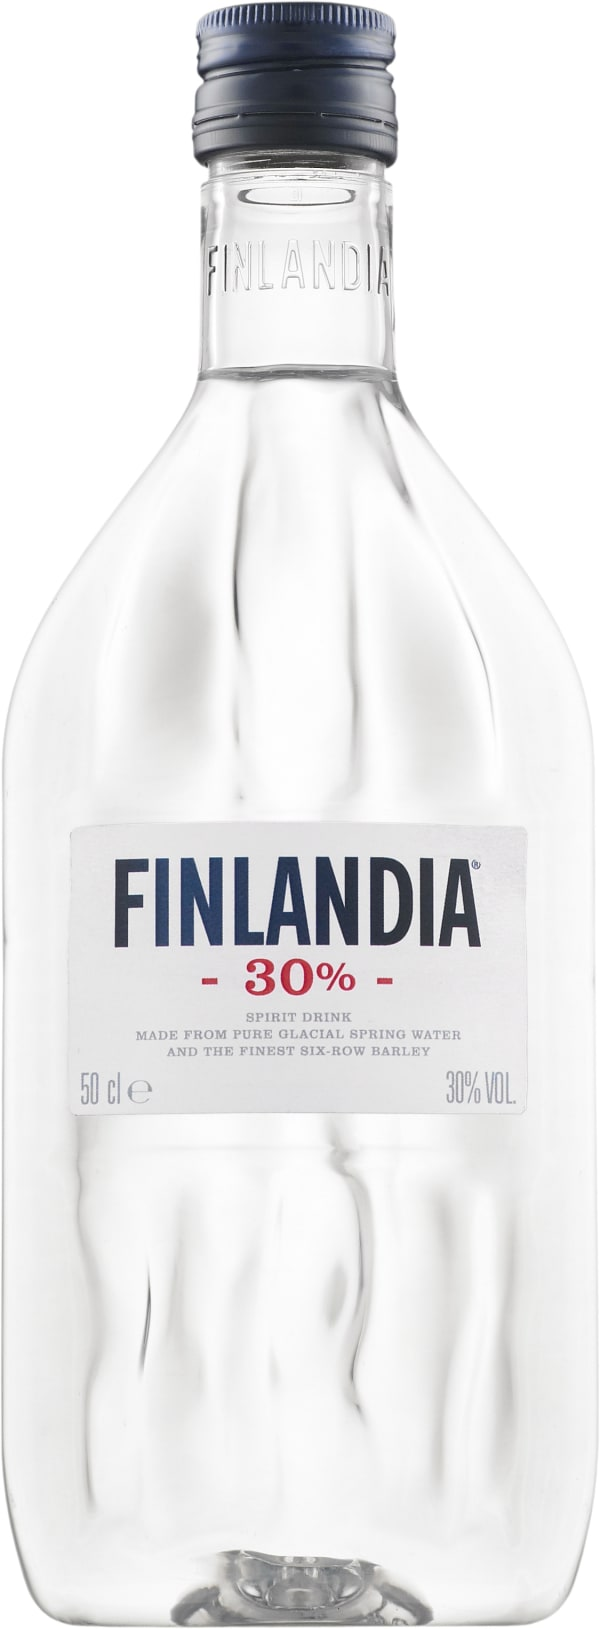 Finlandia 30% plastic bottle